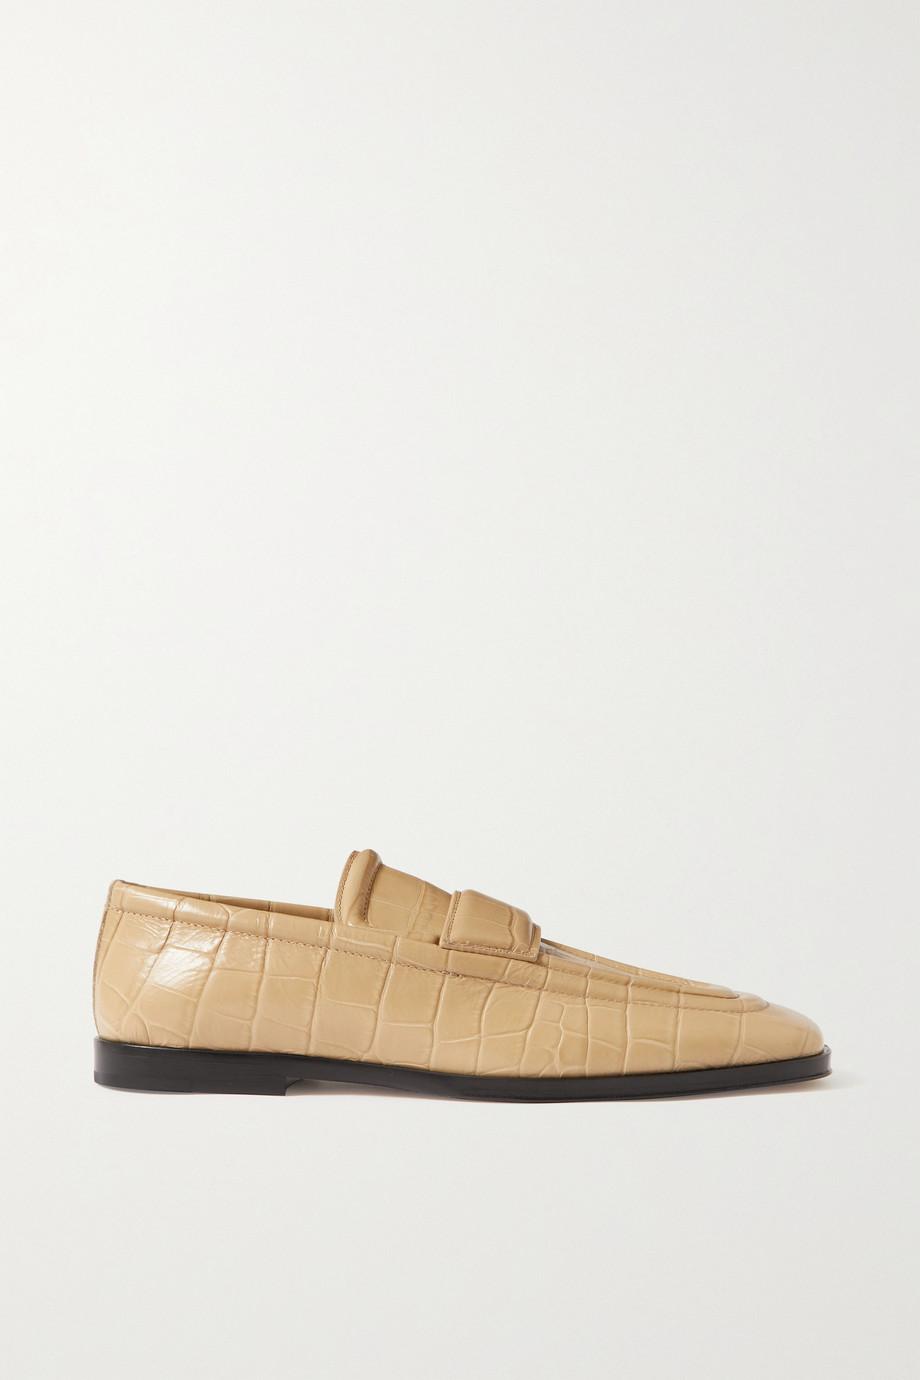 Bottega Veneta Loafers aus Leder mit Krokodileffekt